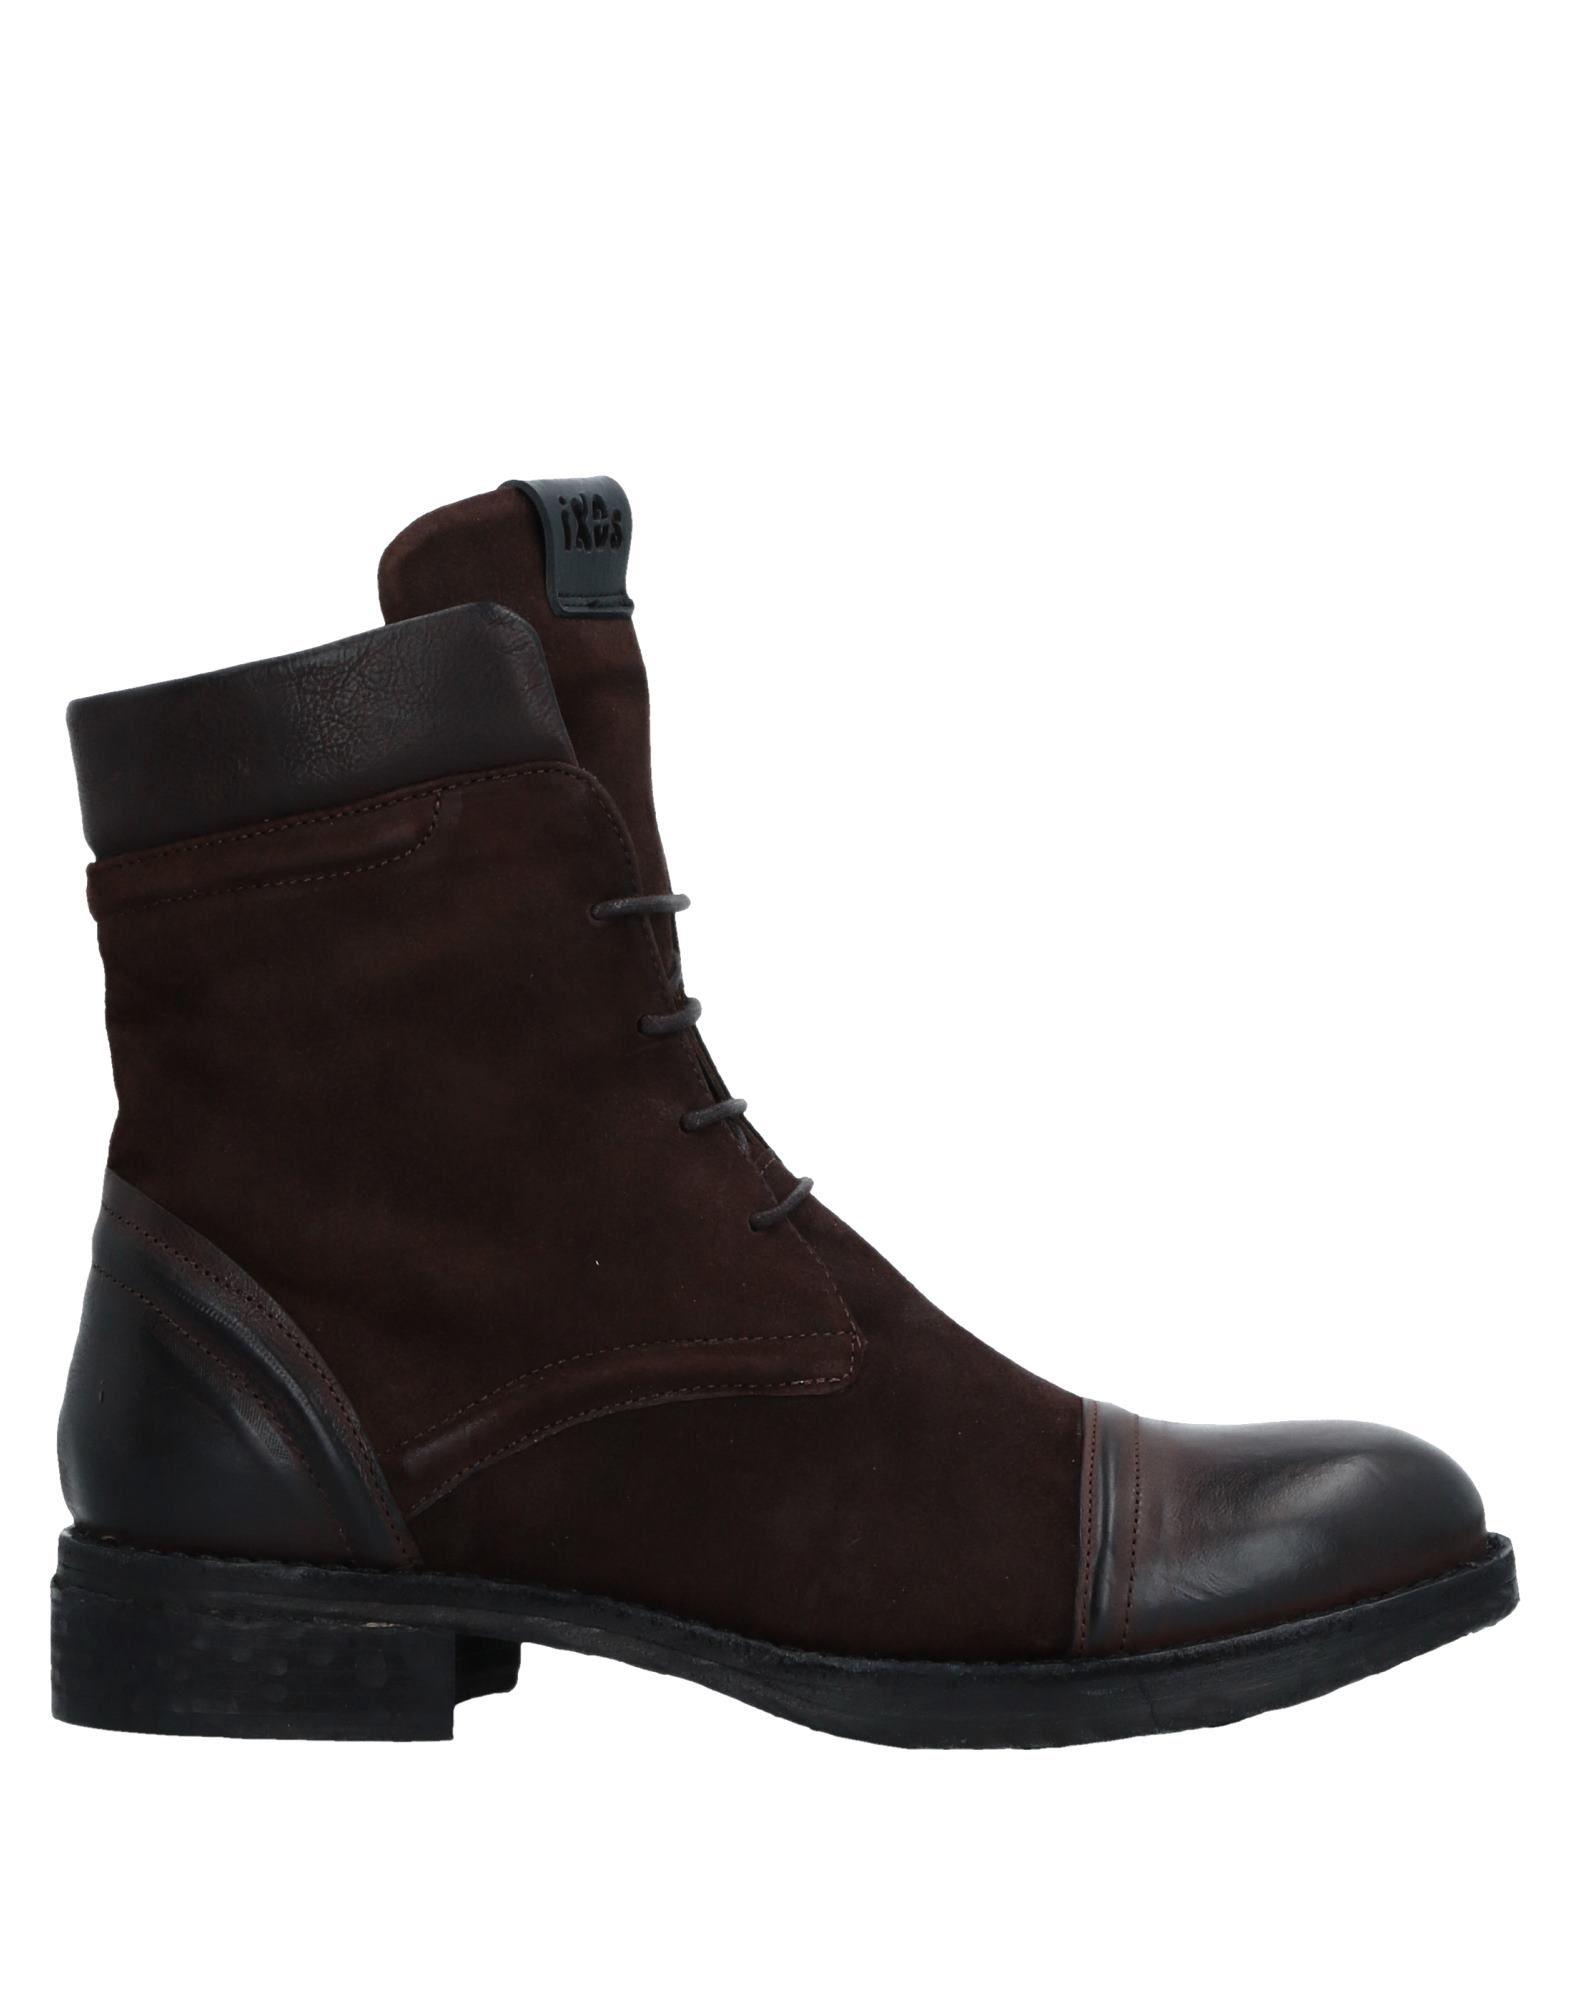 Rabatt Schuhe Ixos Stiefelette Damen  11524242MG